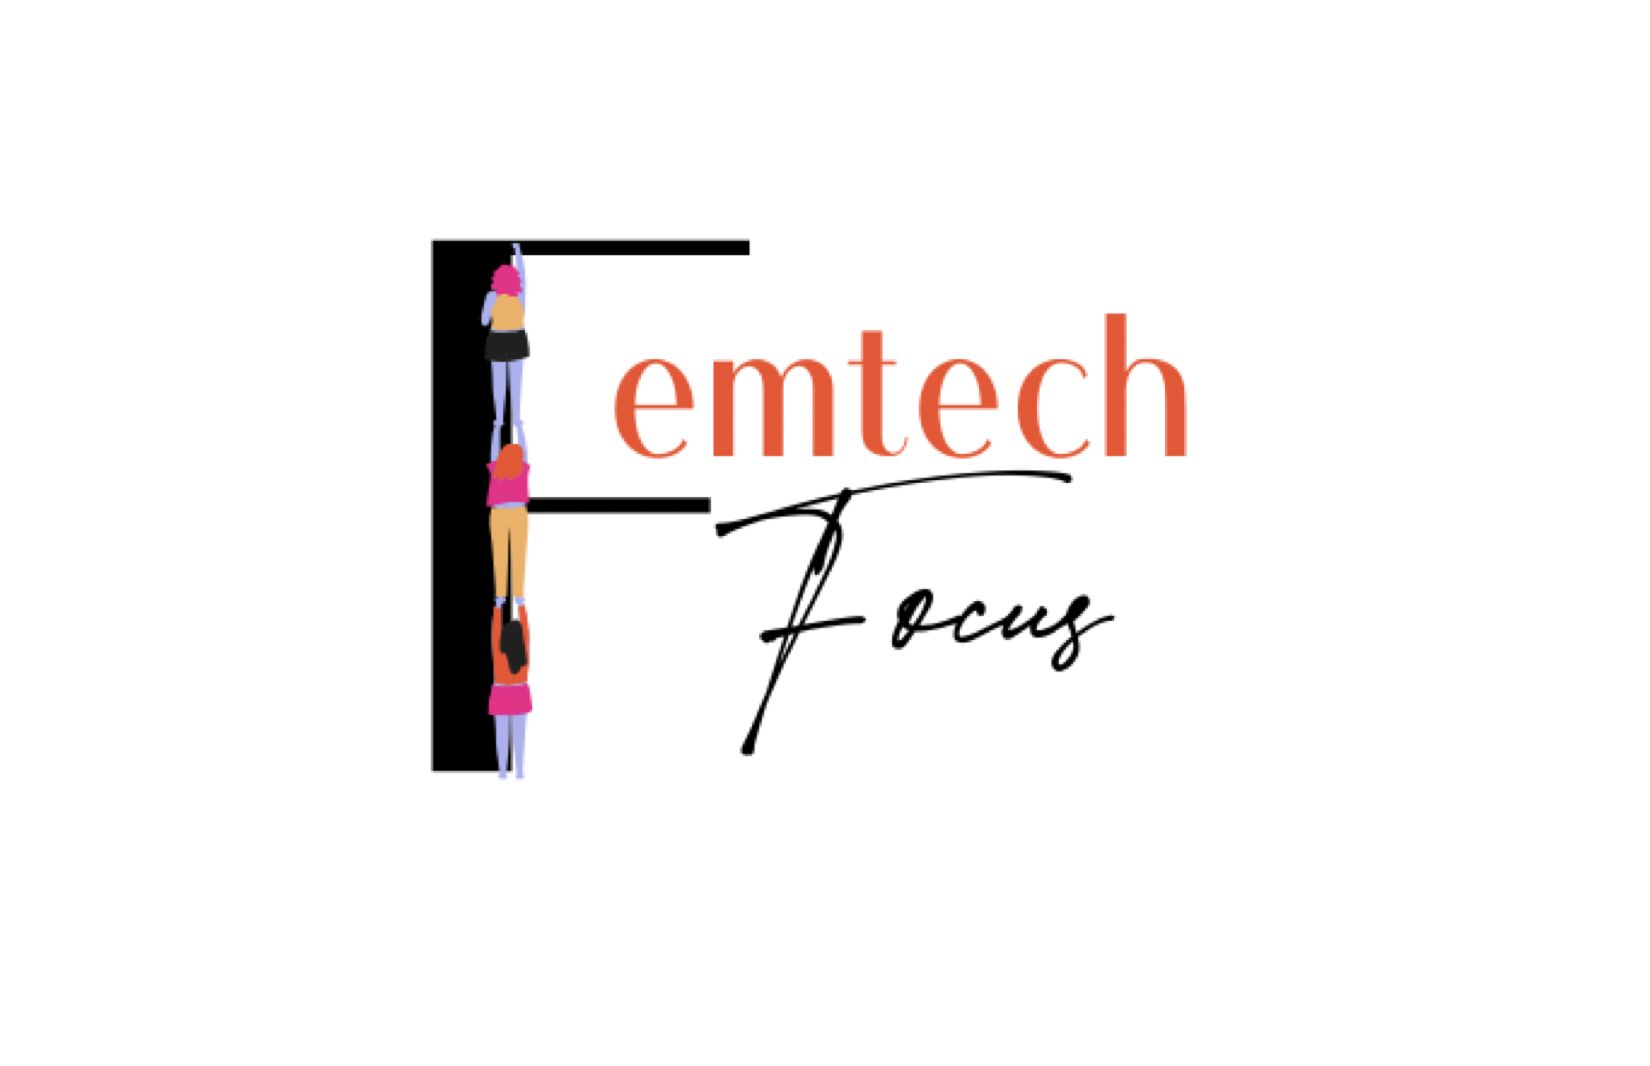 FemTech Focus - Dr. Julie Hakim on Vaginal Stents - Episode 2